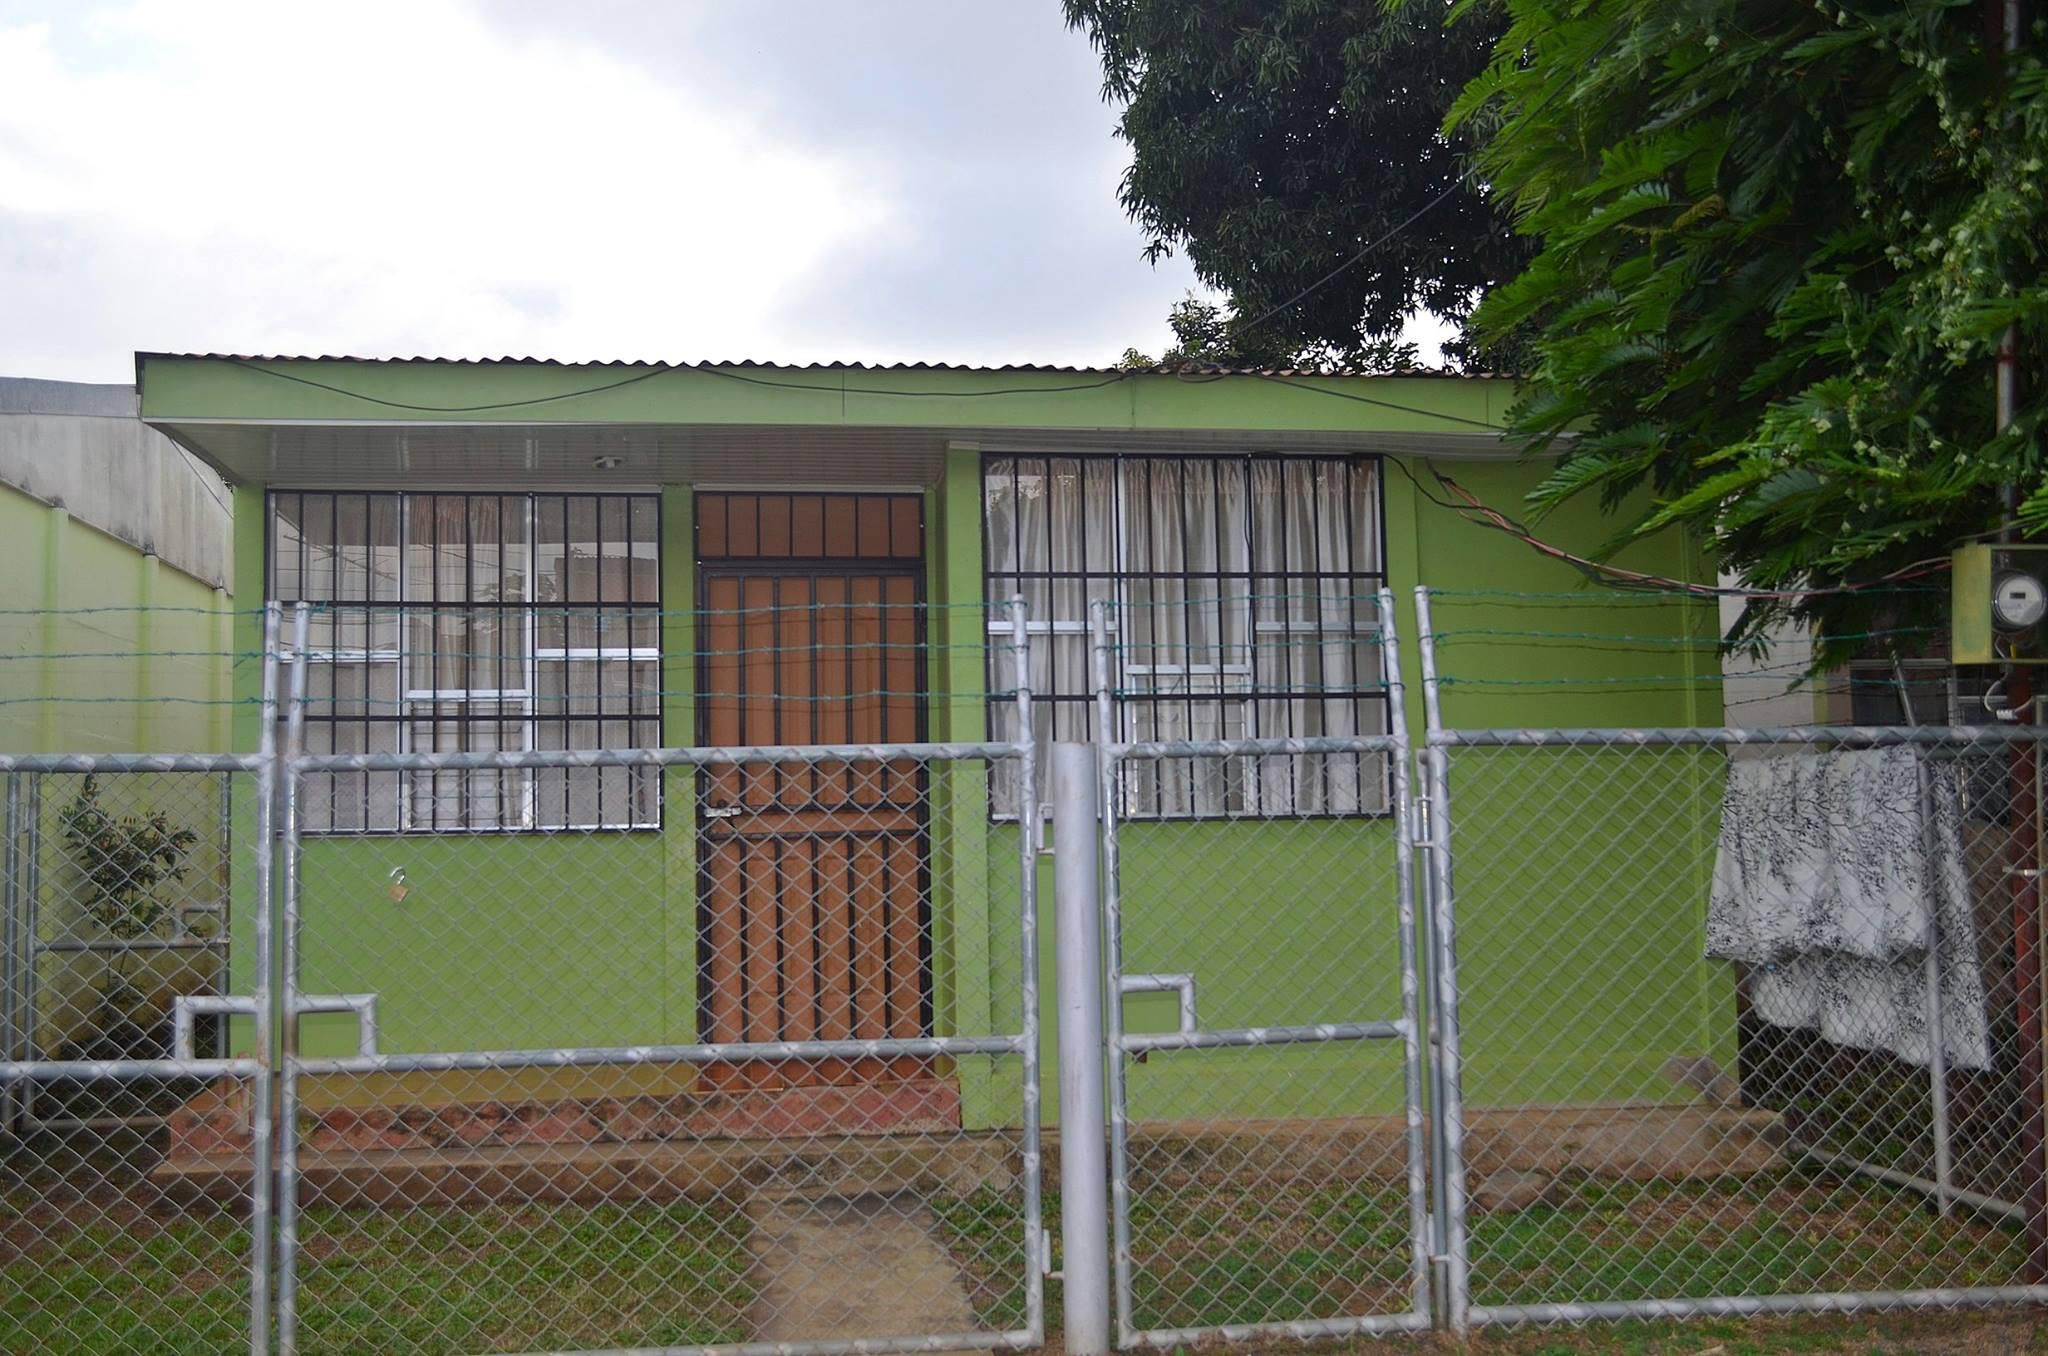 orotina, Orotina barrio-el-kilometro